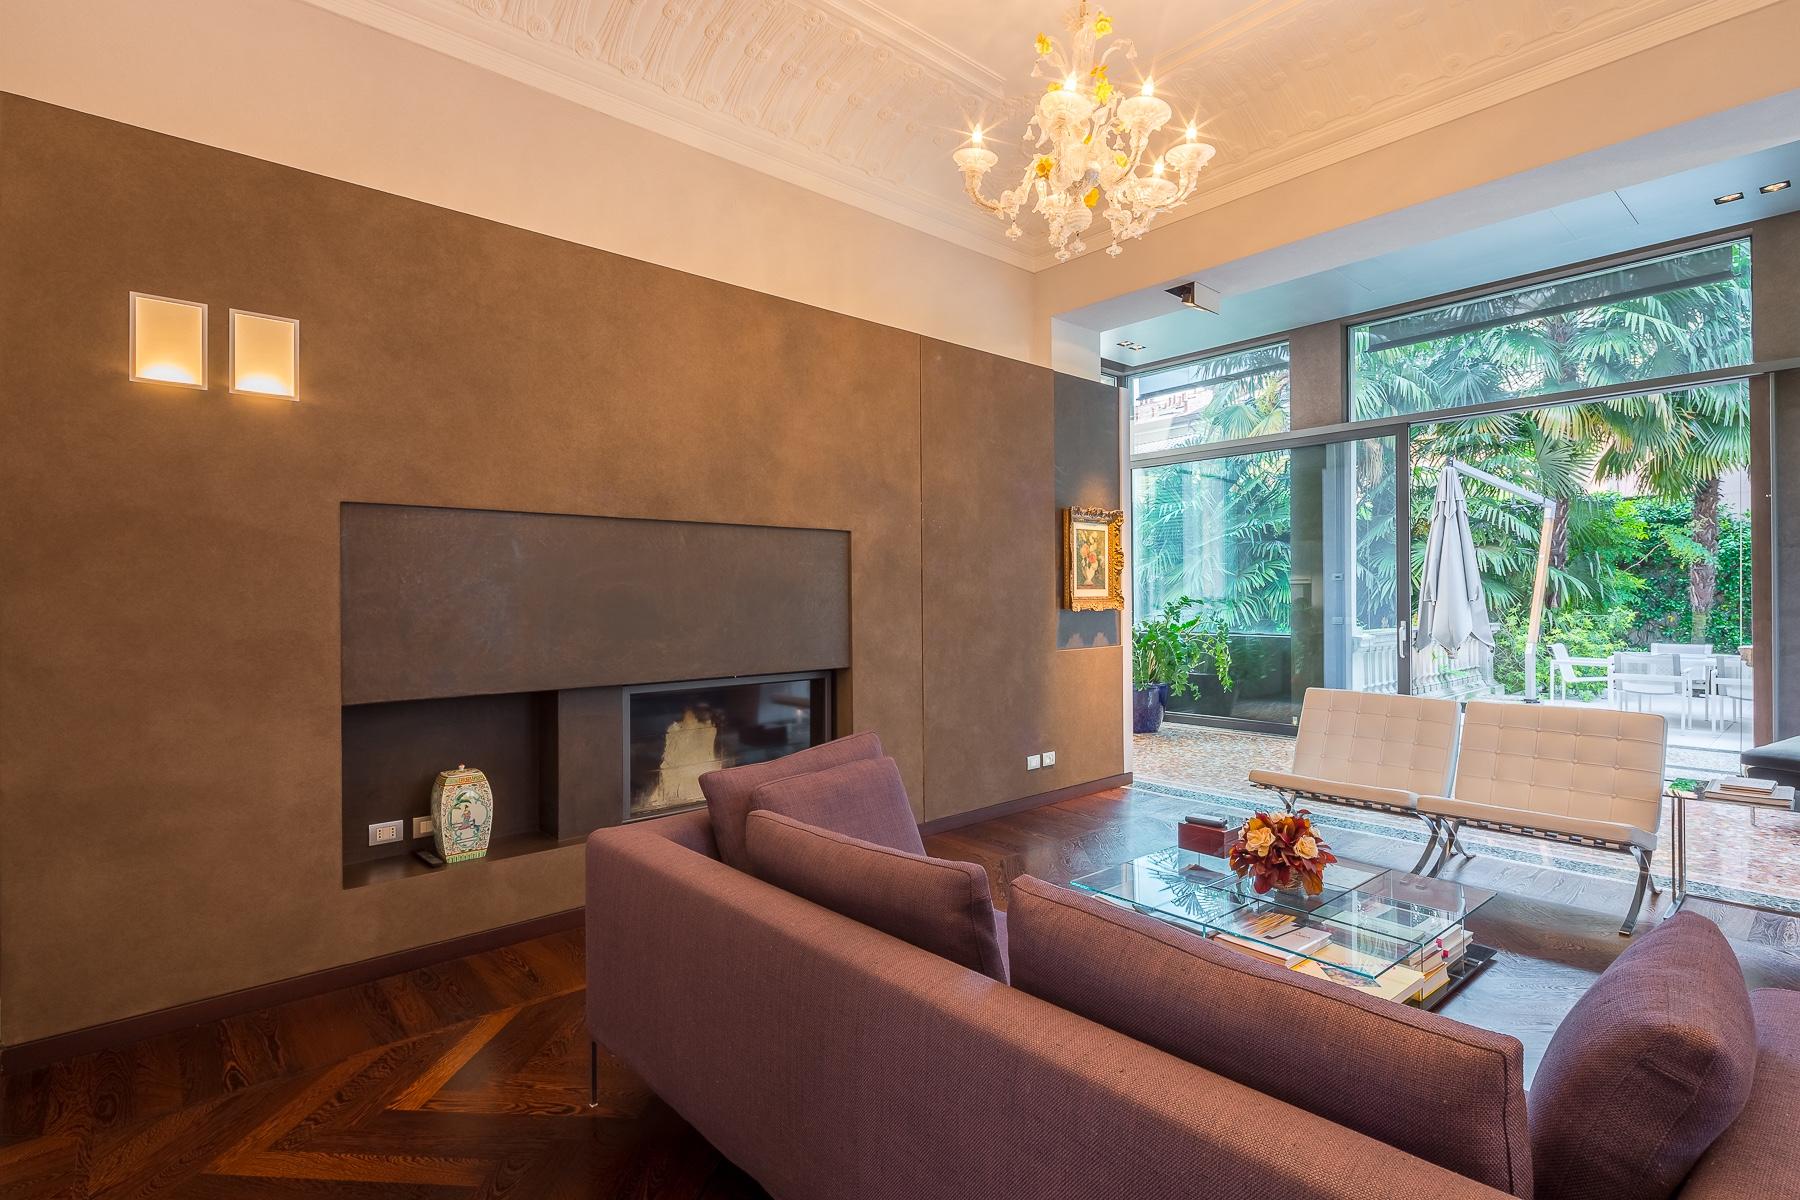 Villa in Vendita a Varese: 5 locali, 800 mq - Foto 5